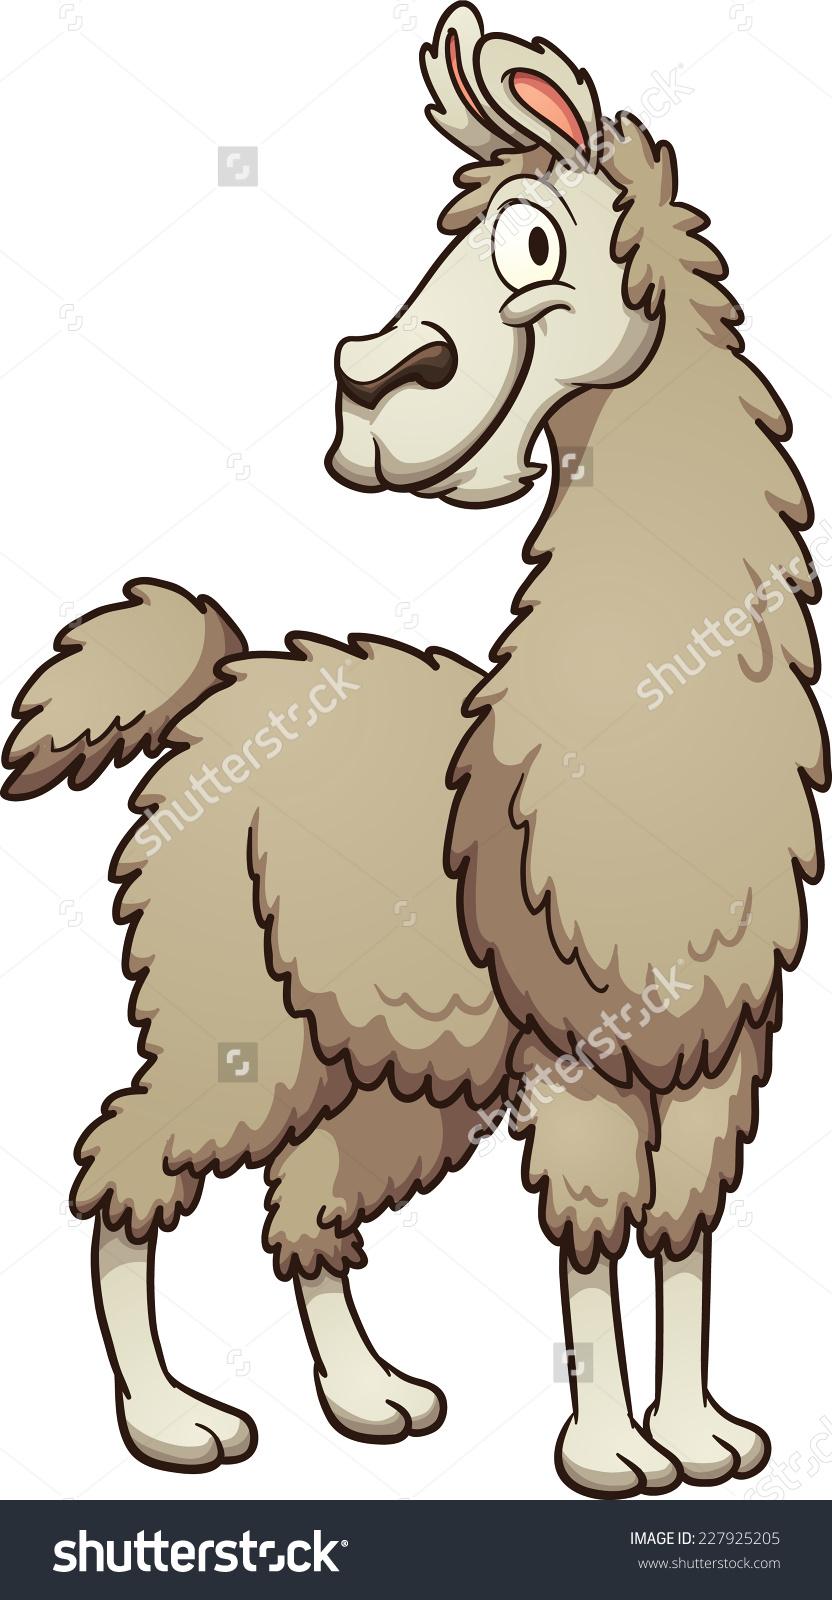 Llama image clipart.